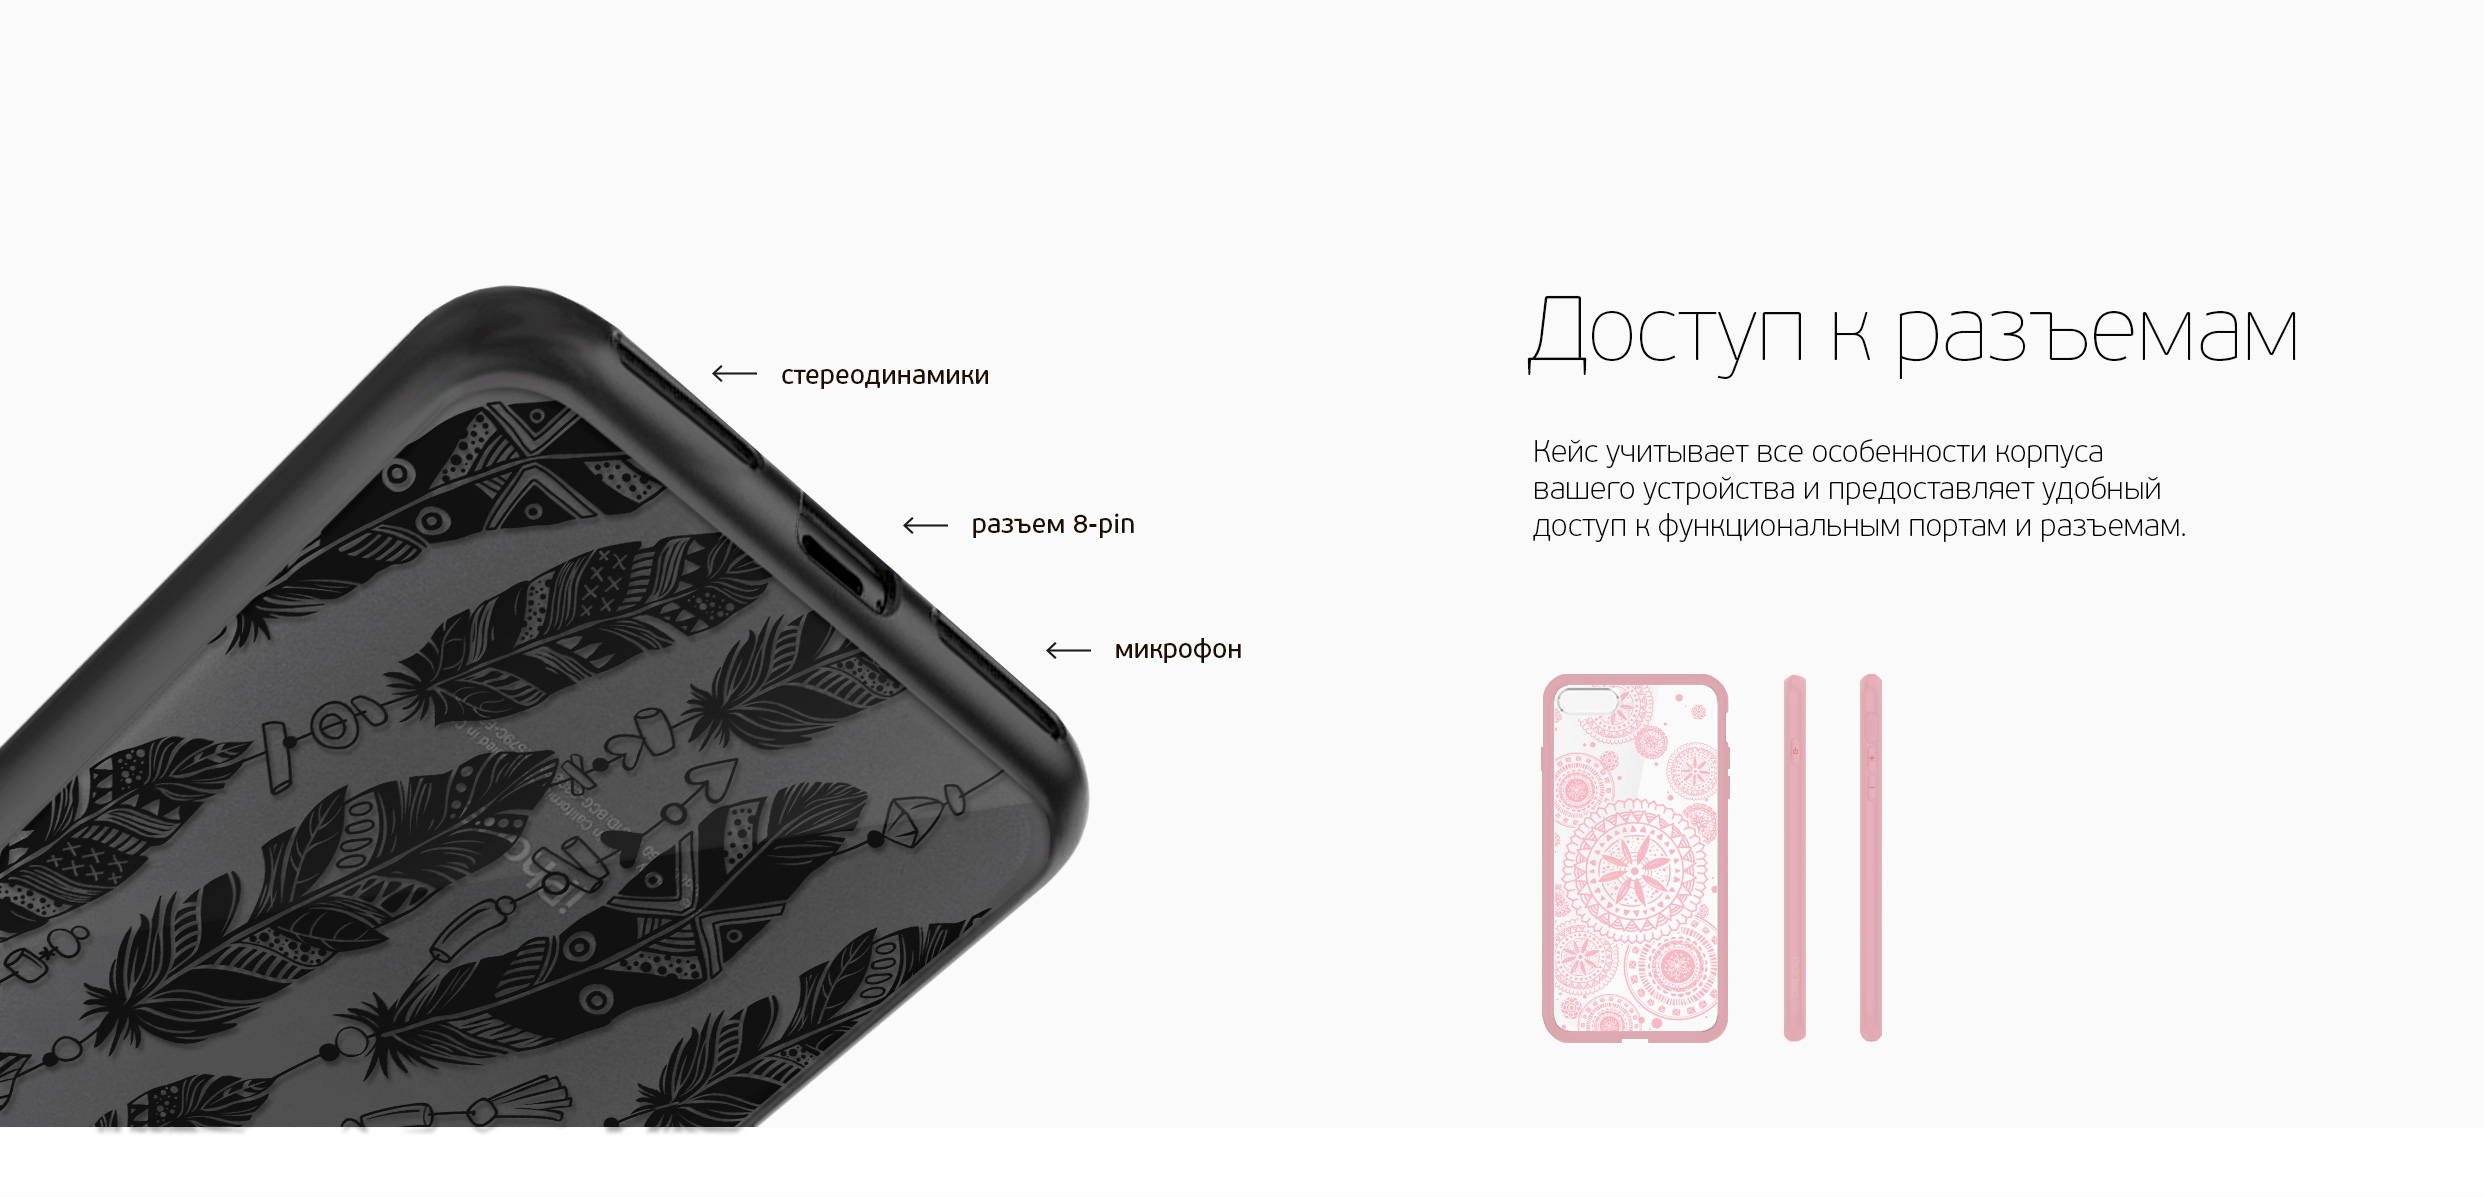 обзор-NEO-ART_iPhone-7-RUS_02.jpg